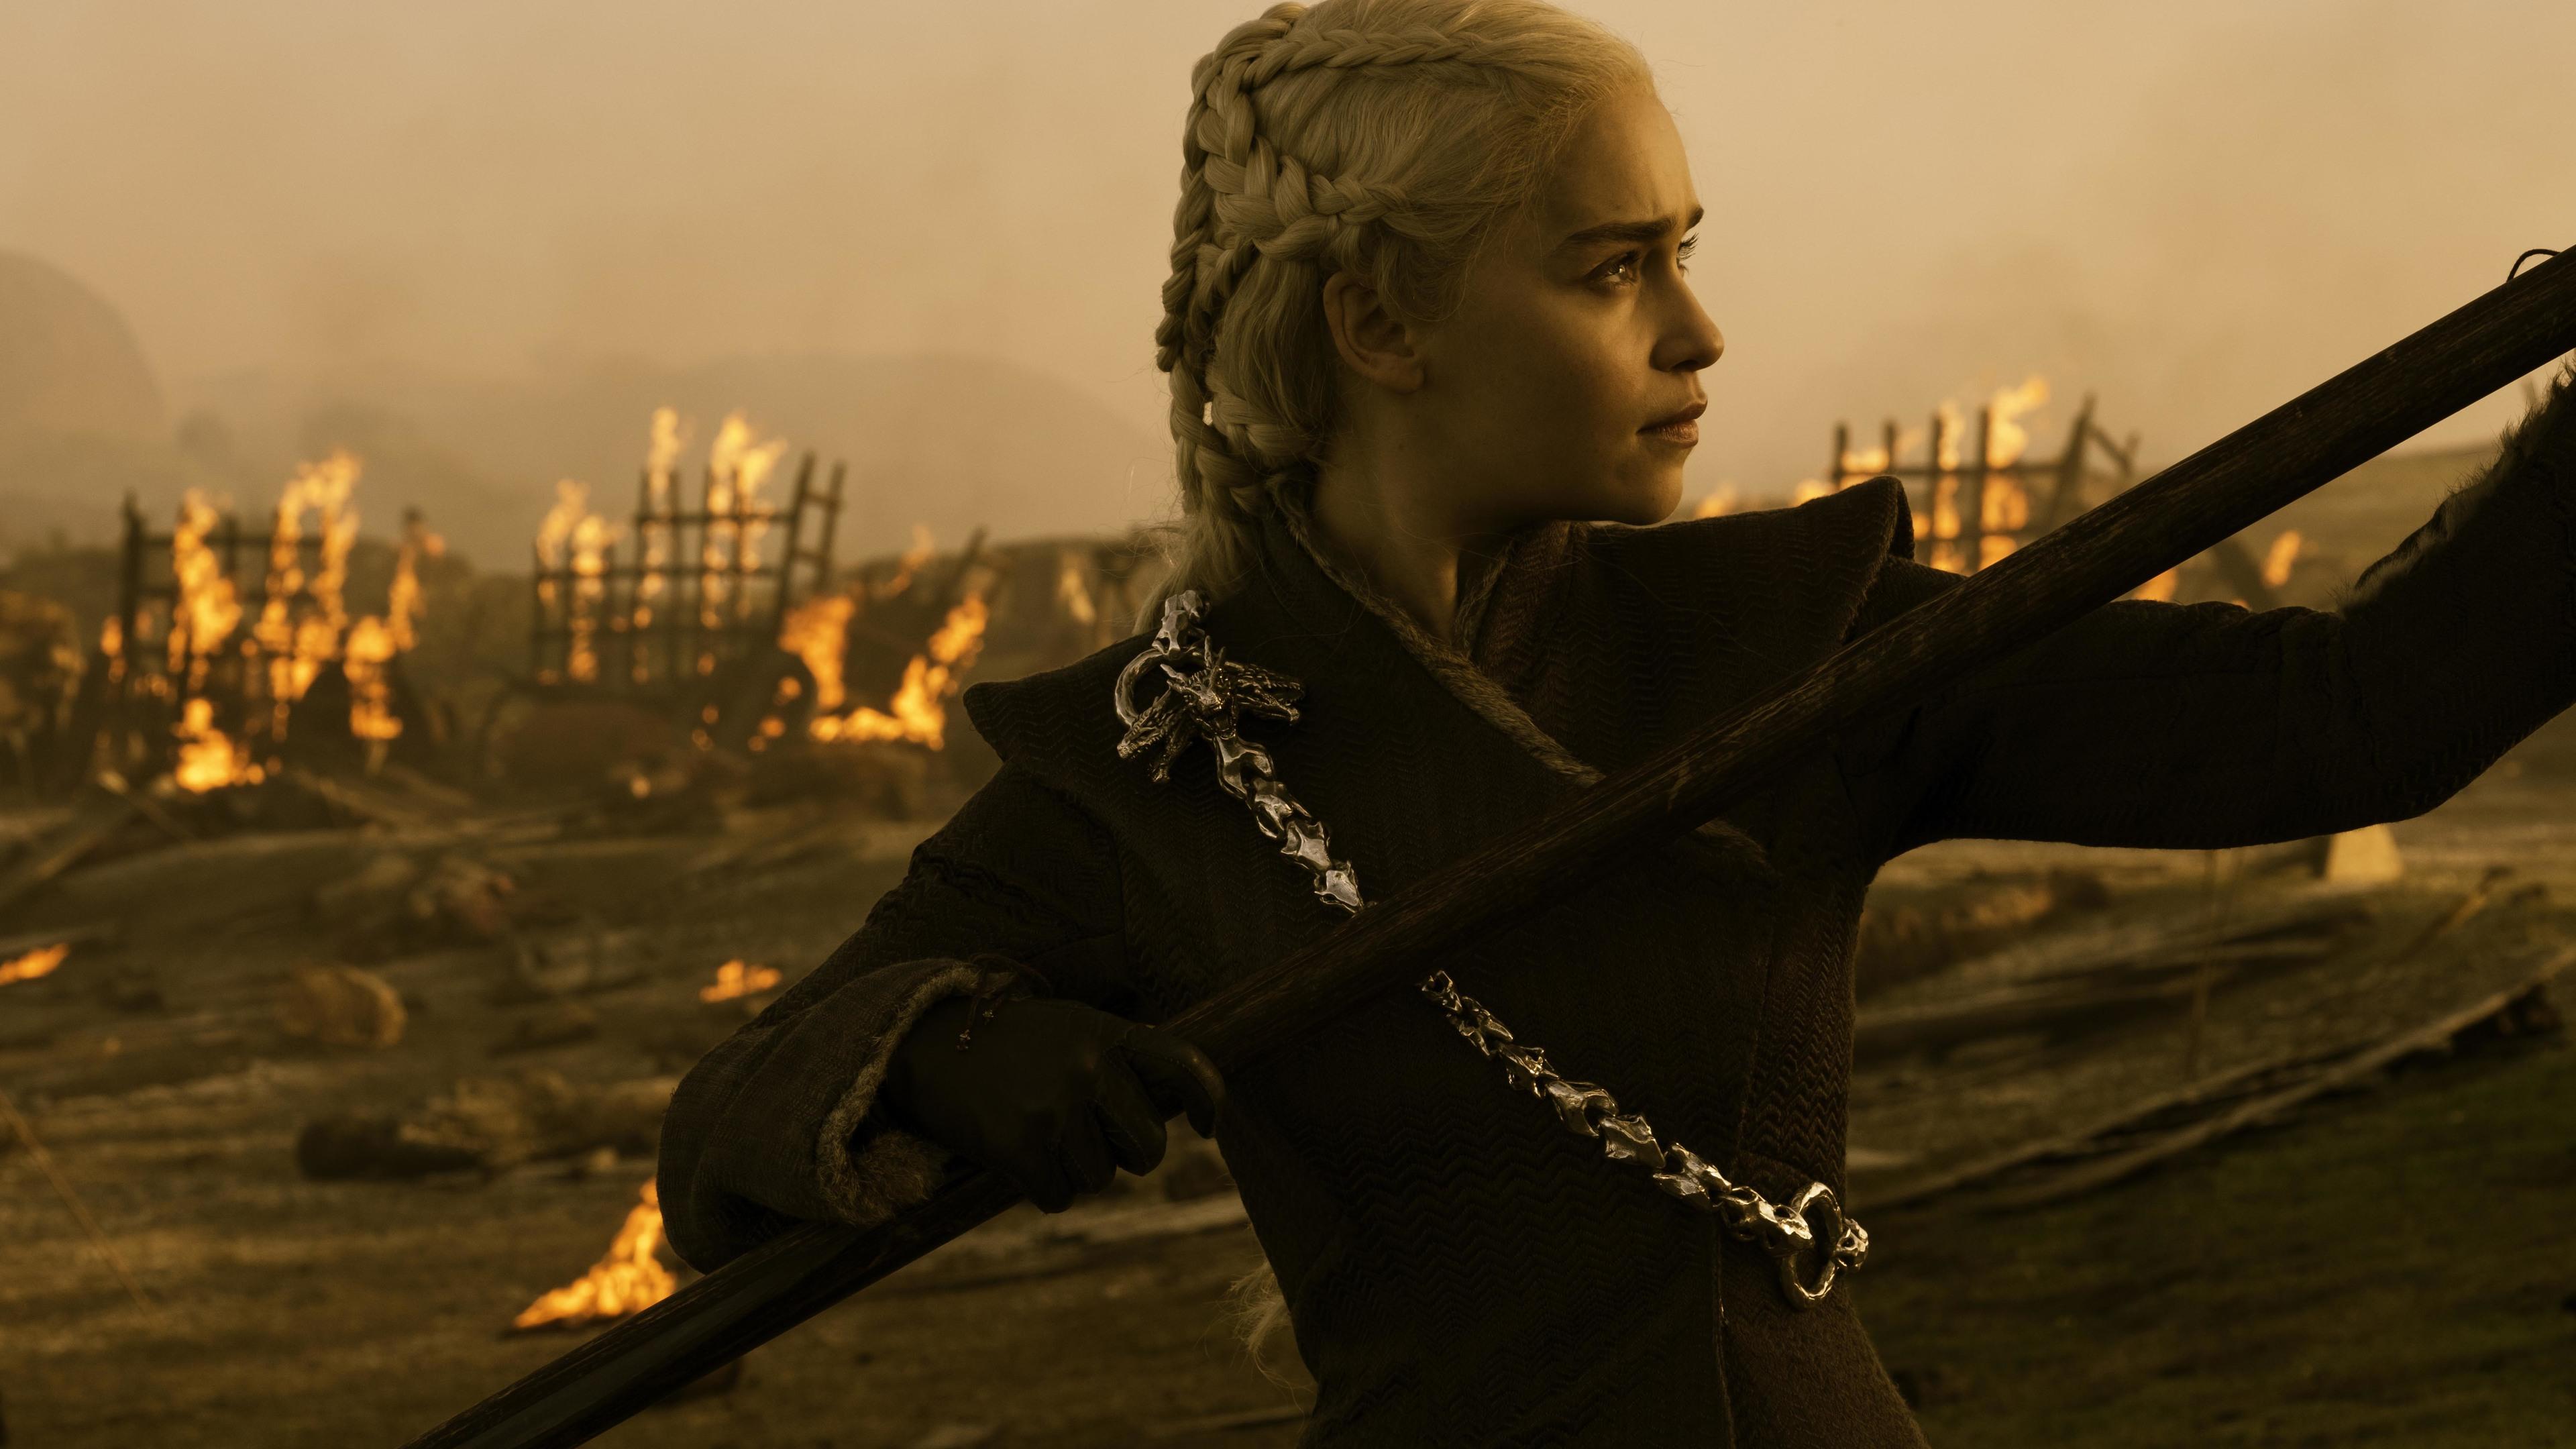 Game Of Thrones Ultra Hd 4k Wallpapers - Daenerys Spoils Of War , HD Wallpaper & Backgrounds